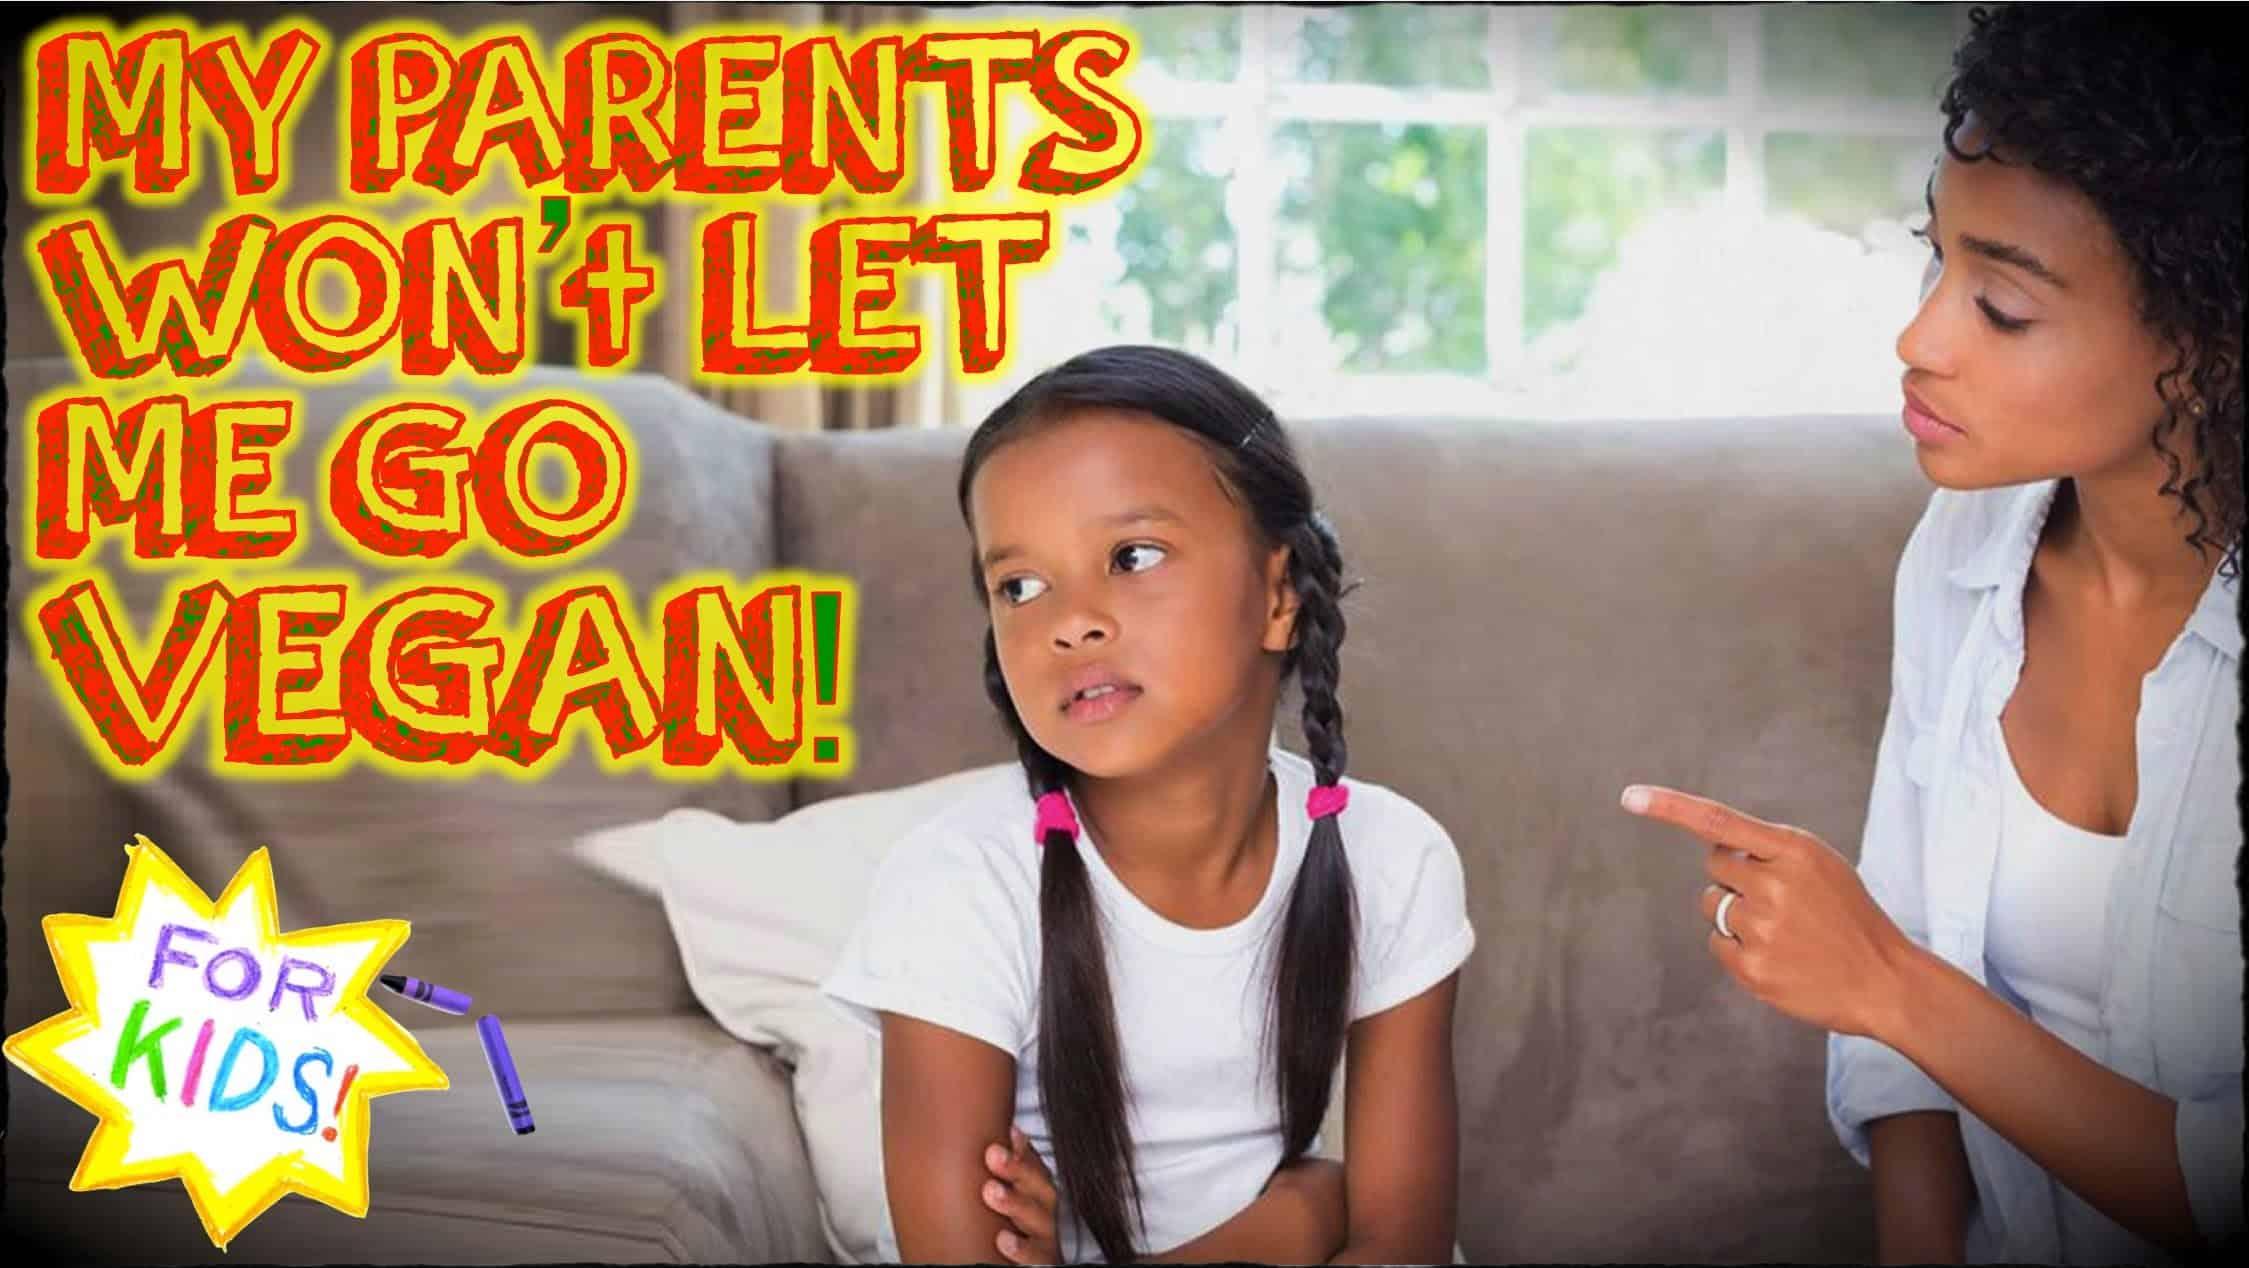 My Parents Won't Let Me Go Vegan! [Advice from REAL VEGAN